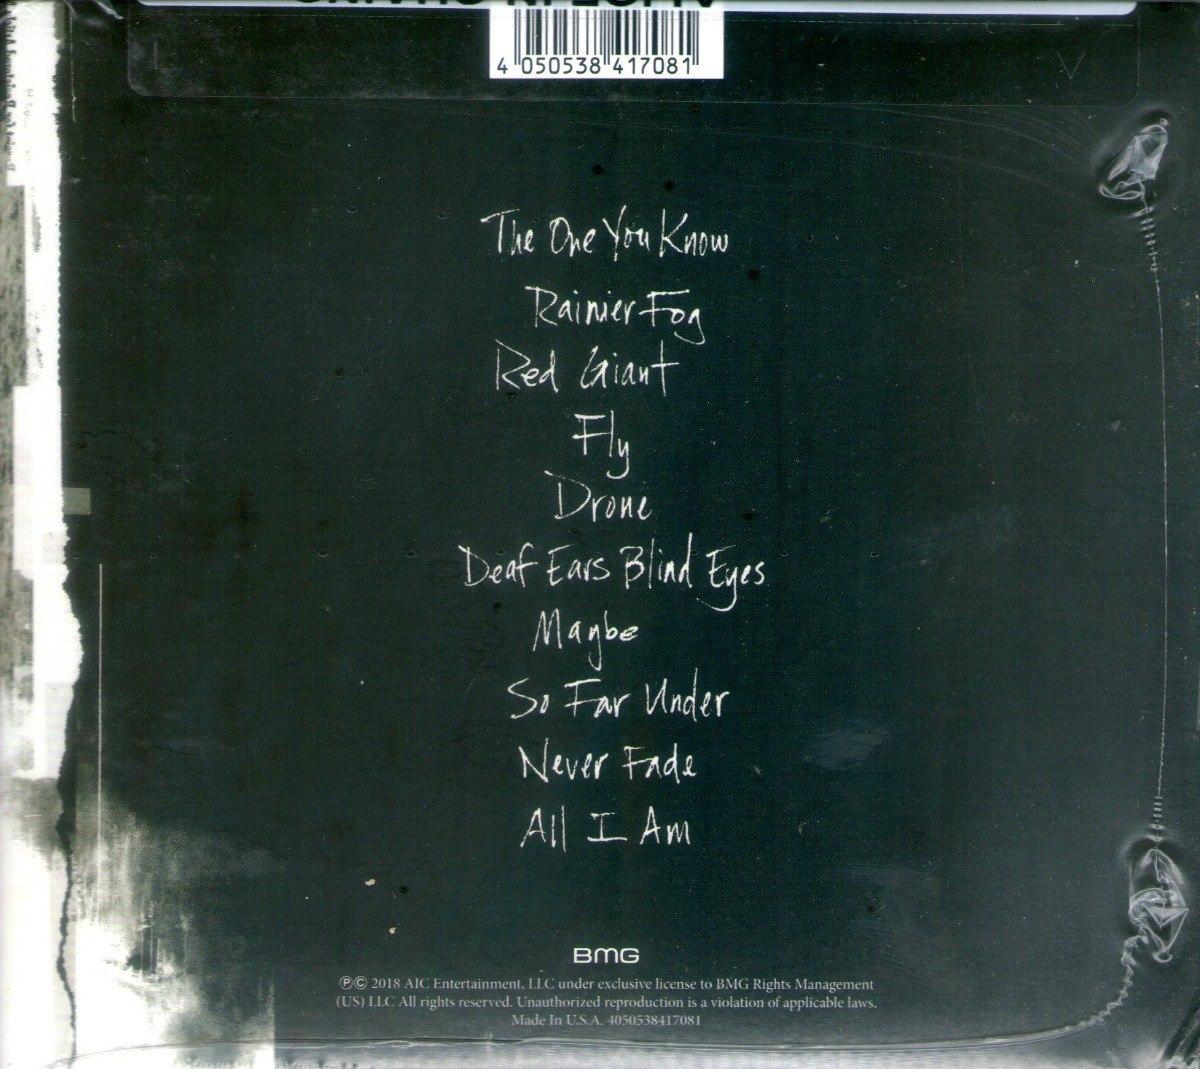 Rainier Fog Alice In Chains: Alice In Chains Rainier Fog Cd Sellado Us ¡ En Stock